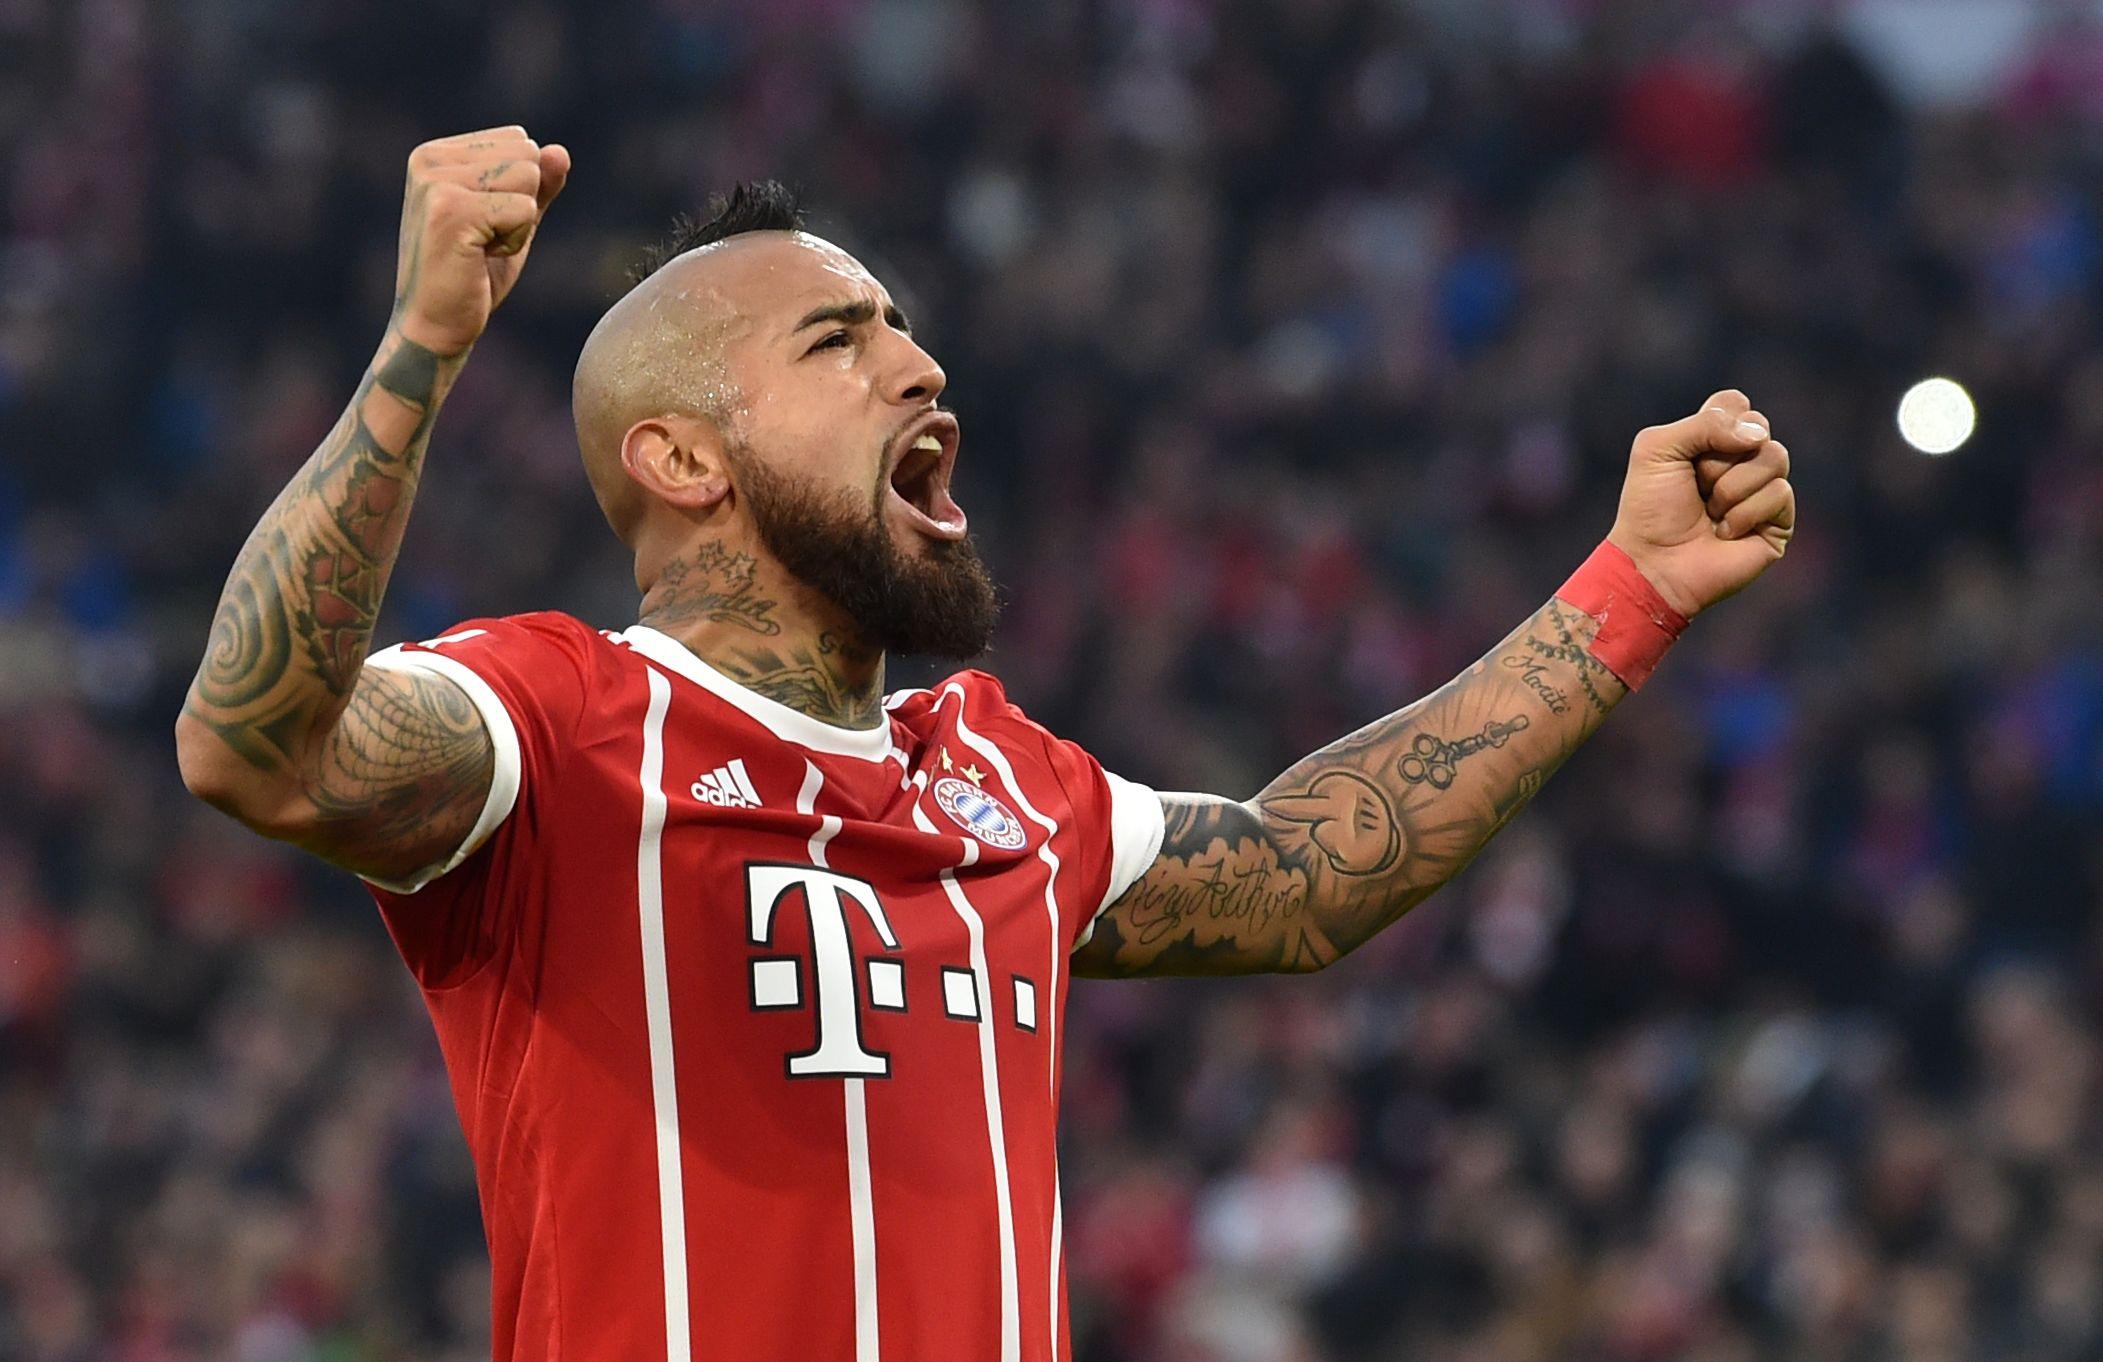 Football - Etranger - Le Bayern balaye Augsbourg et prend le large